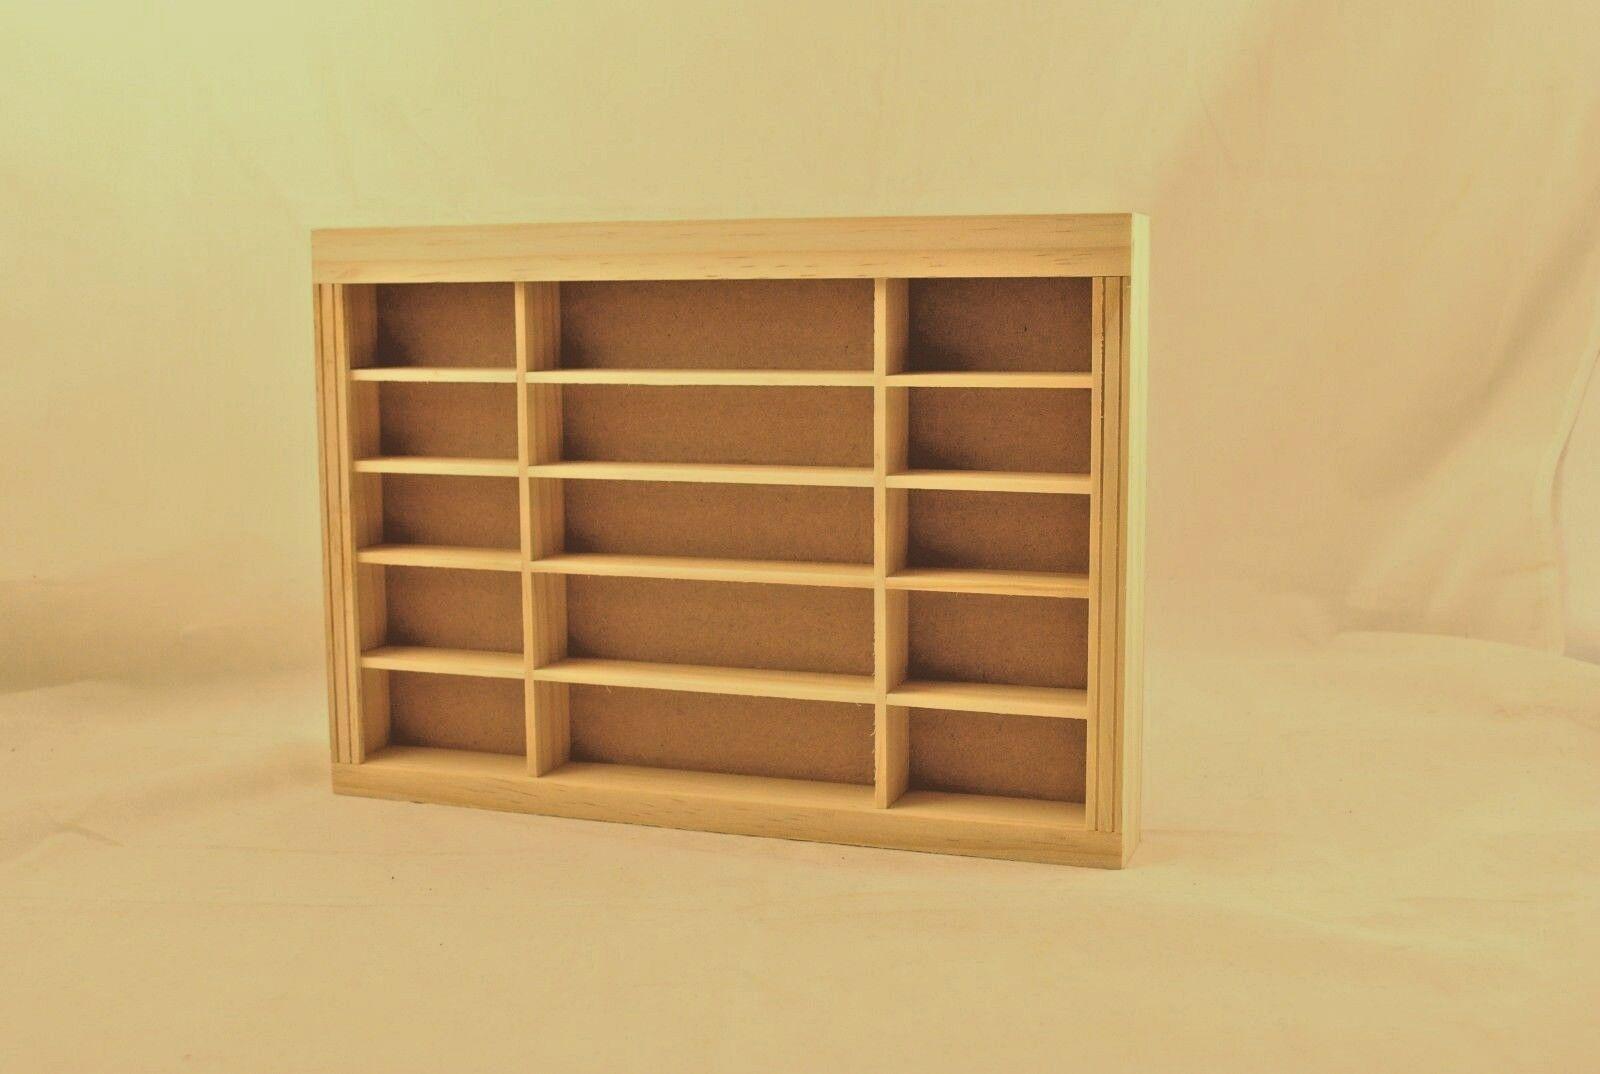 Store Shelf Unit 9954 Dollhouse Miniature 1 12 Scale Houseworks Unfinished Wood